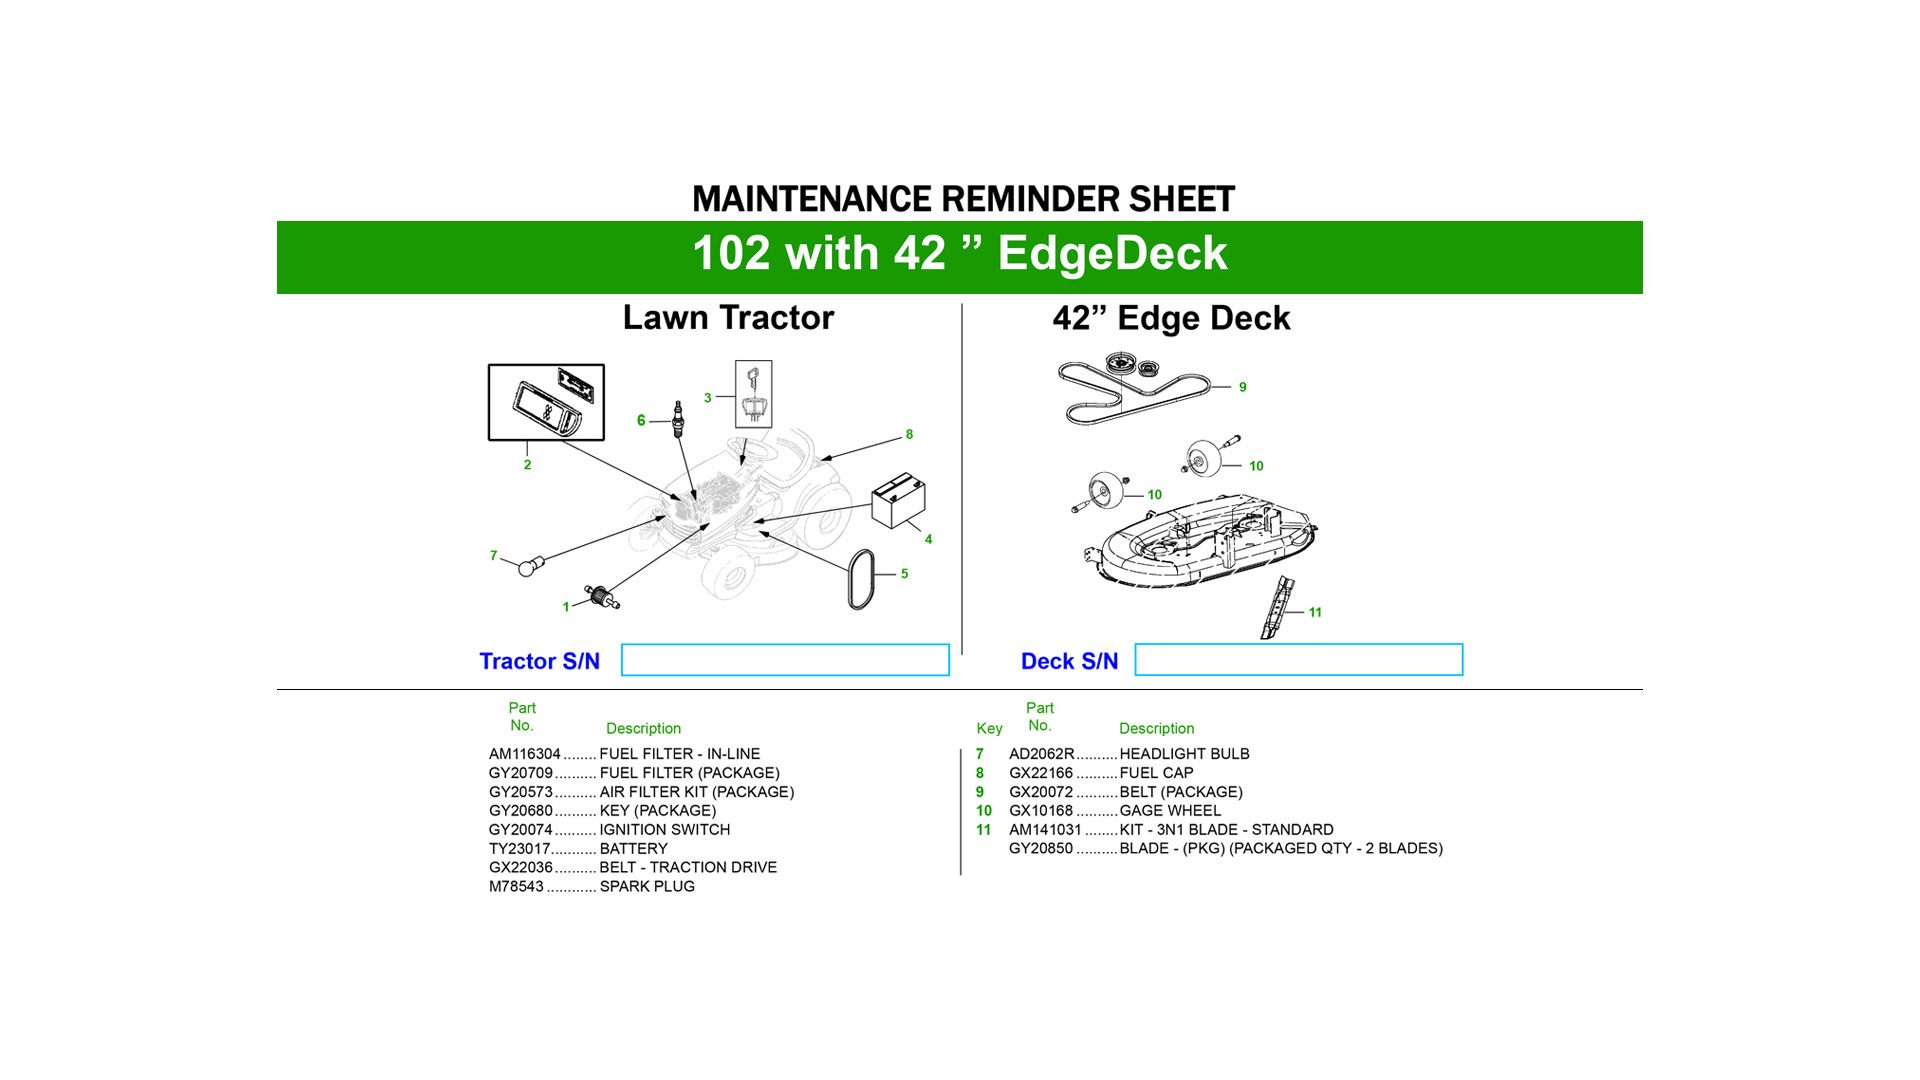 Farm Equipment Maintenance Log Spreadsheet In Quick